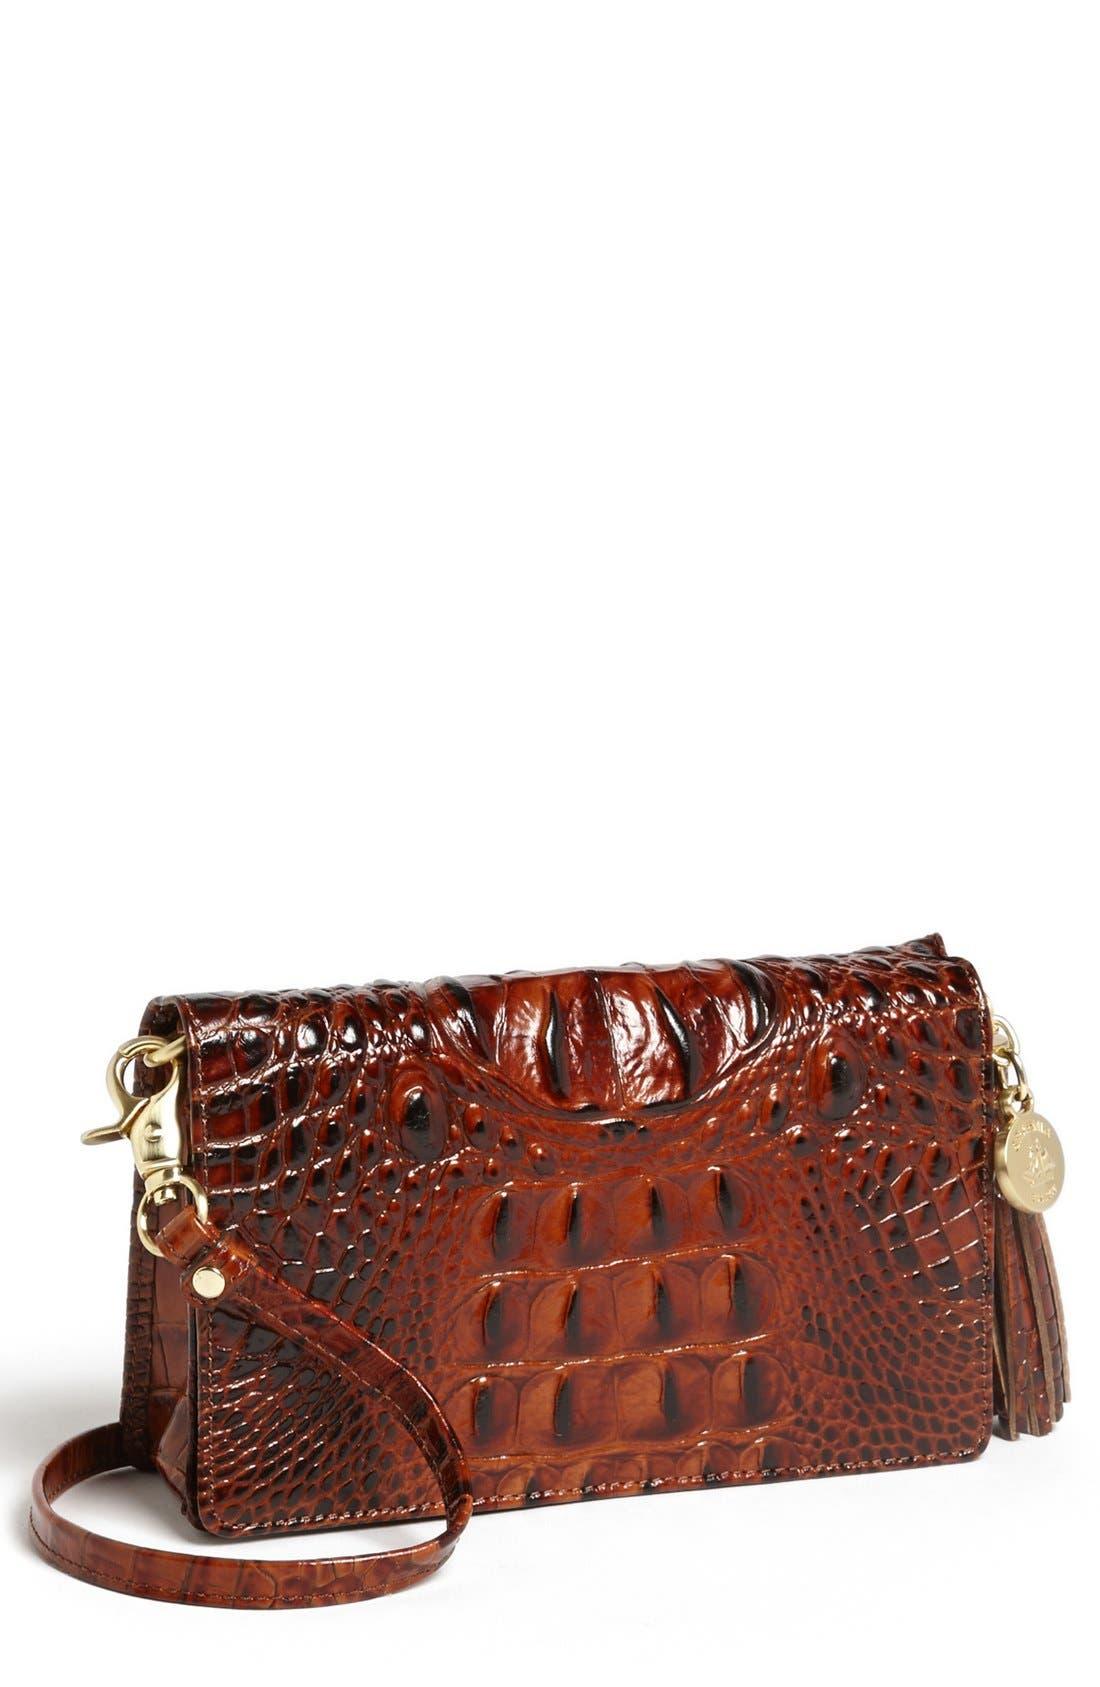 Main Image - Brahmin 'Melbourne - Amelia' Croc Embossed Leather Crossbody Clutch